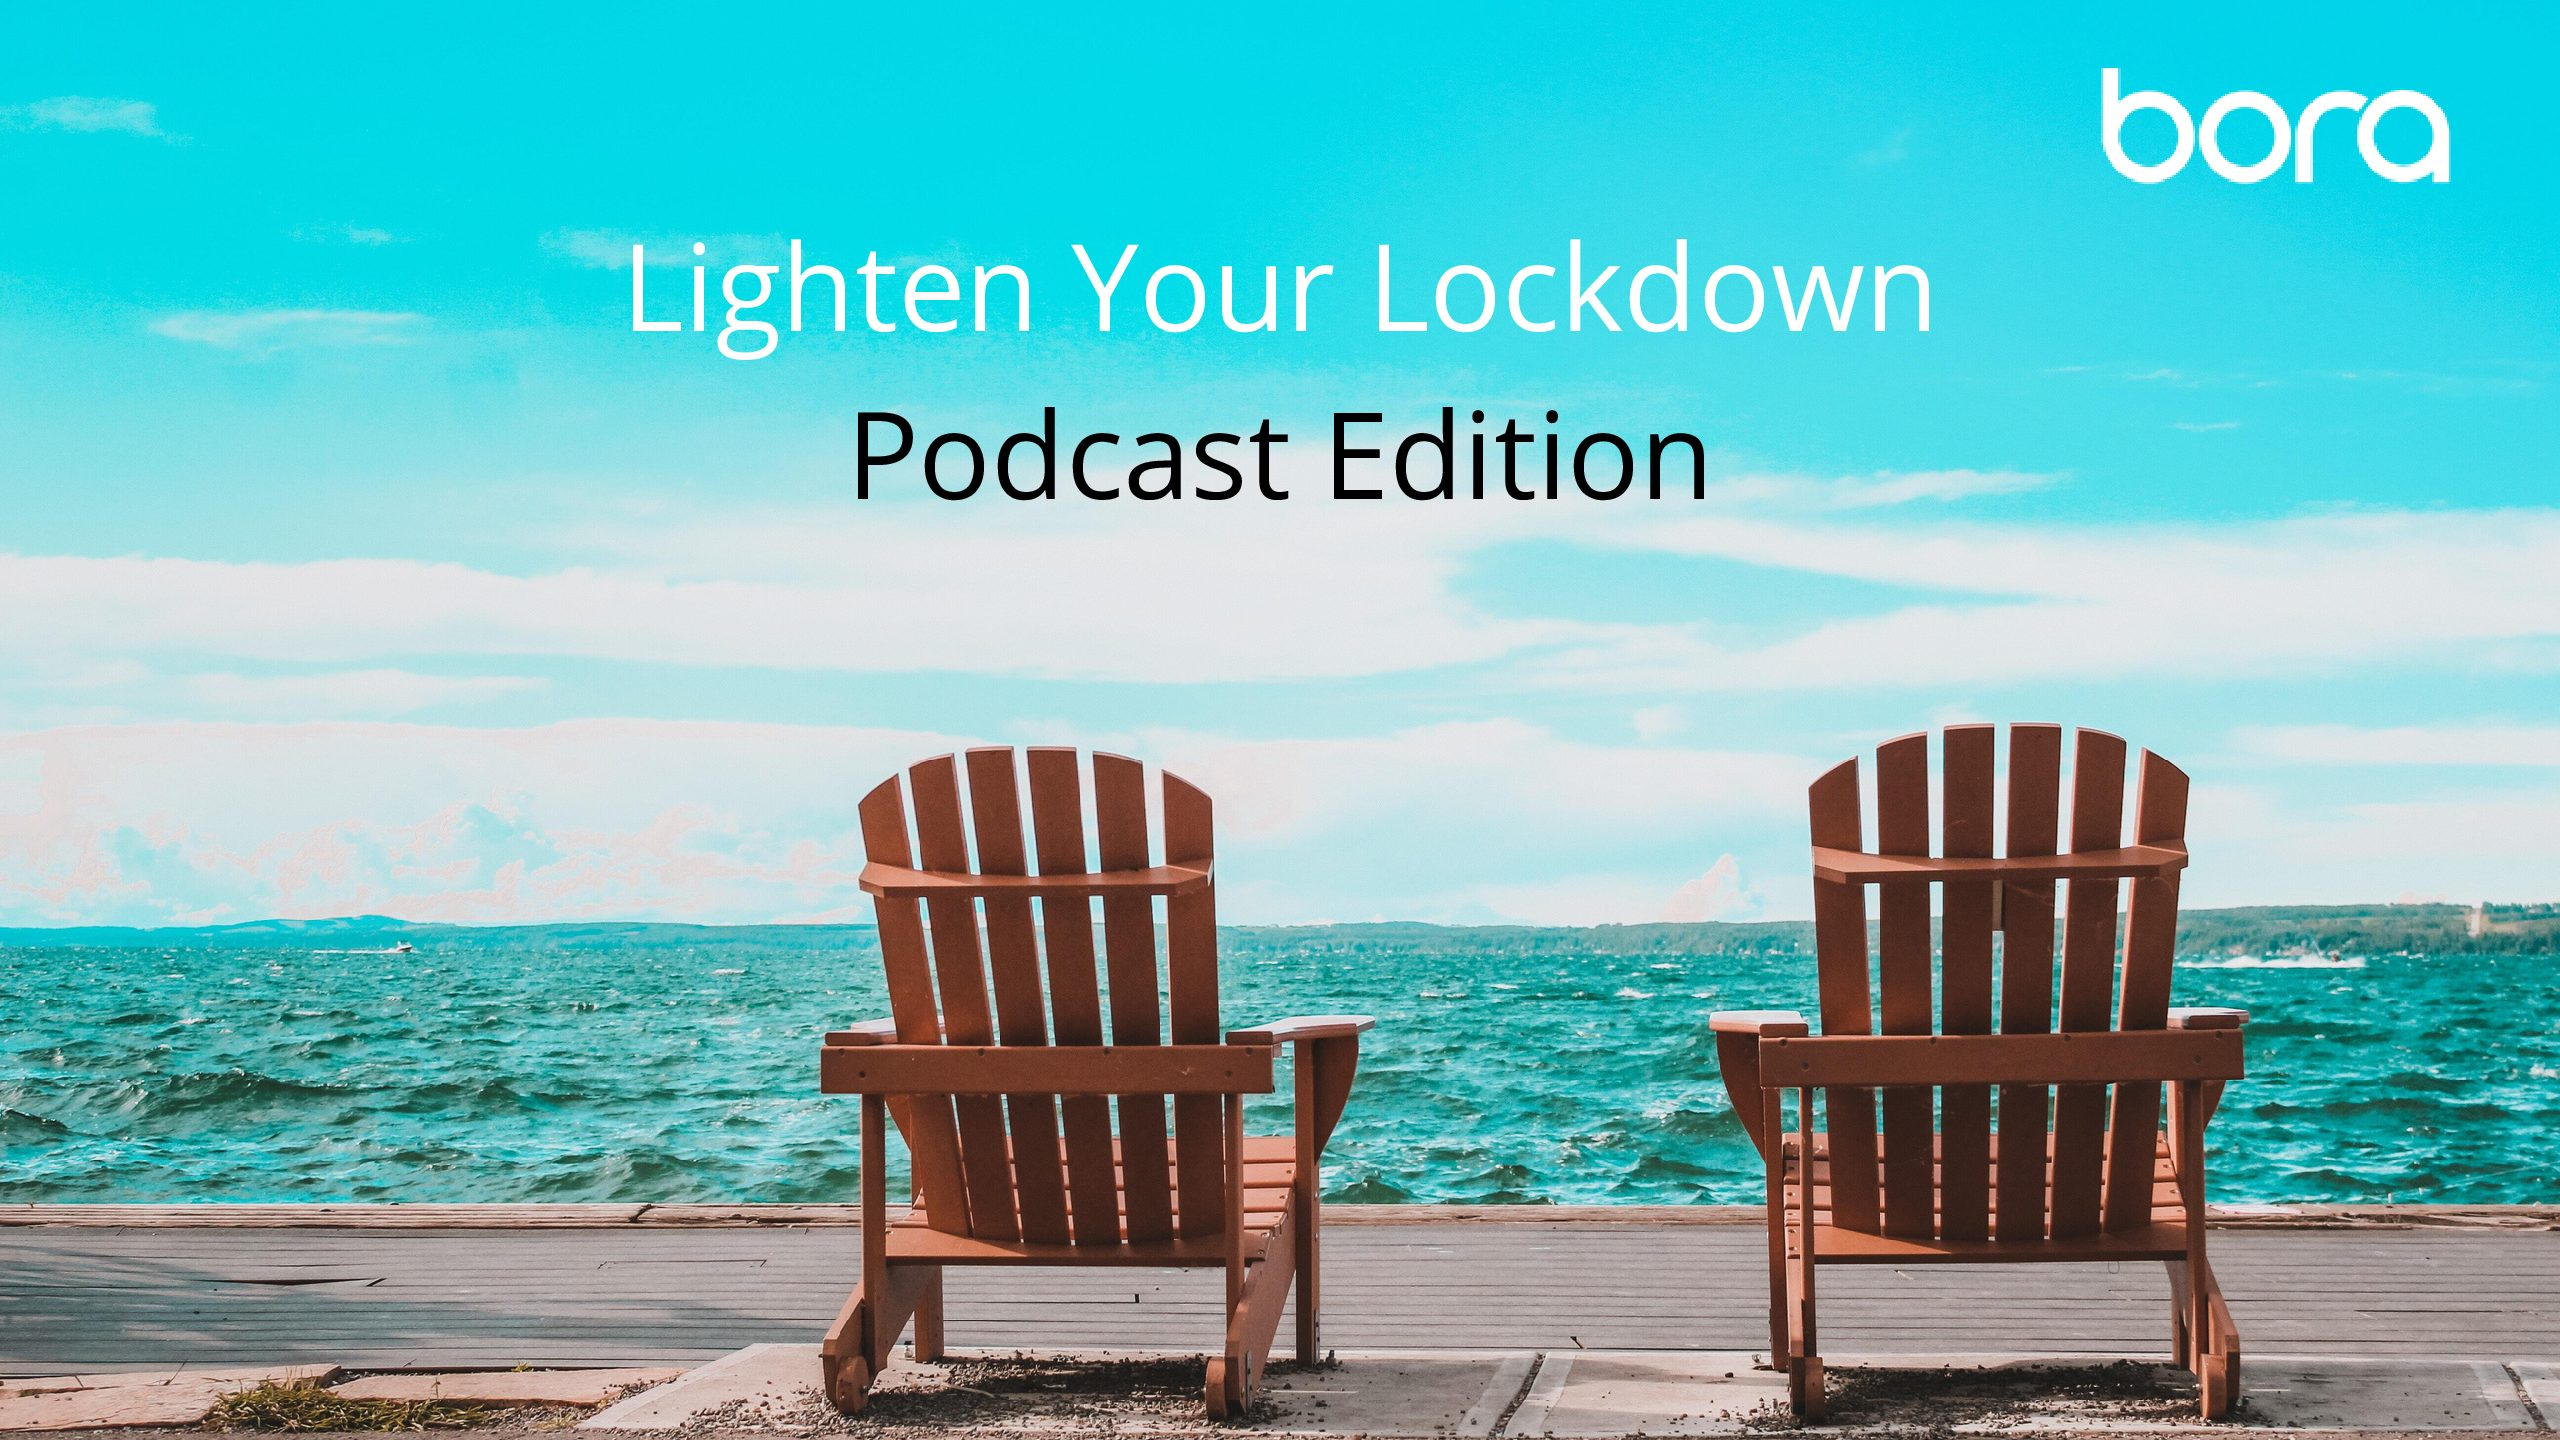 Lighten Your Lockdown: Podcast Edition